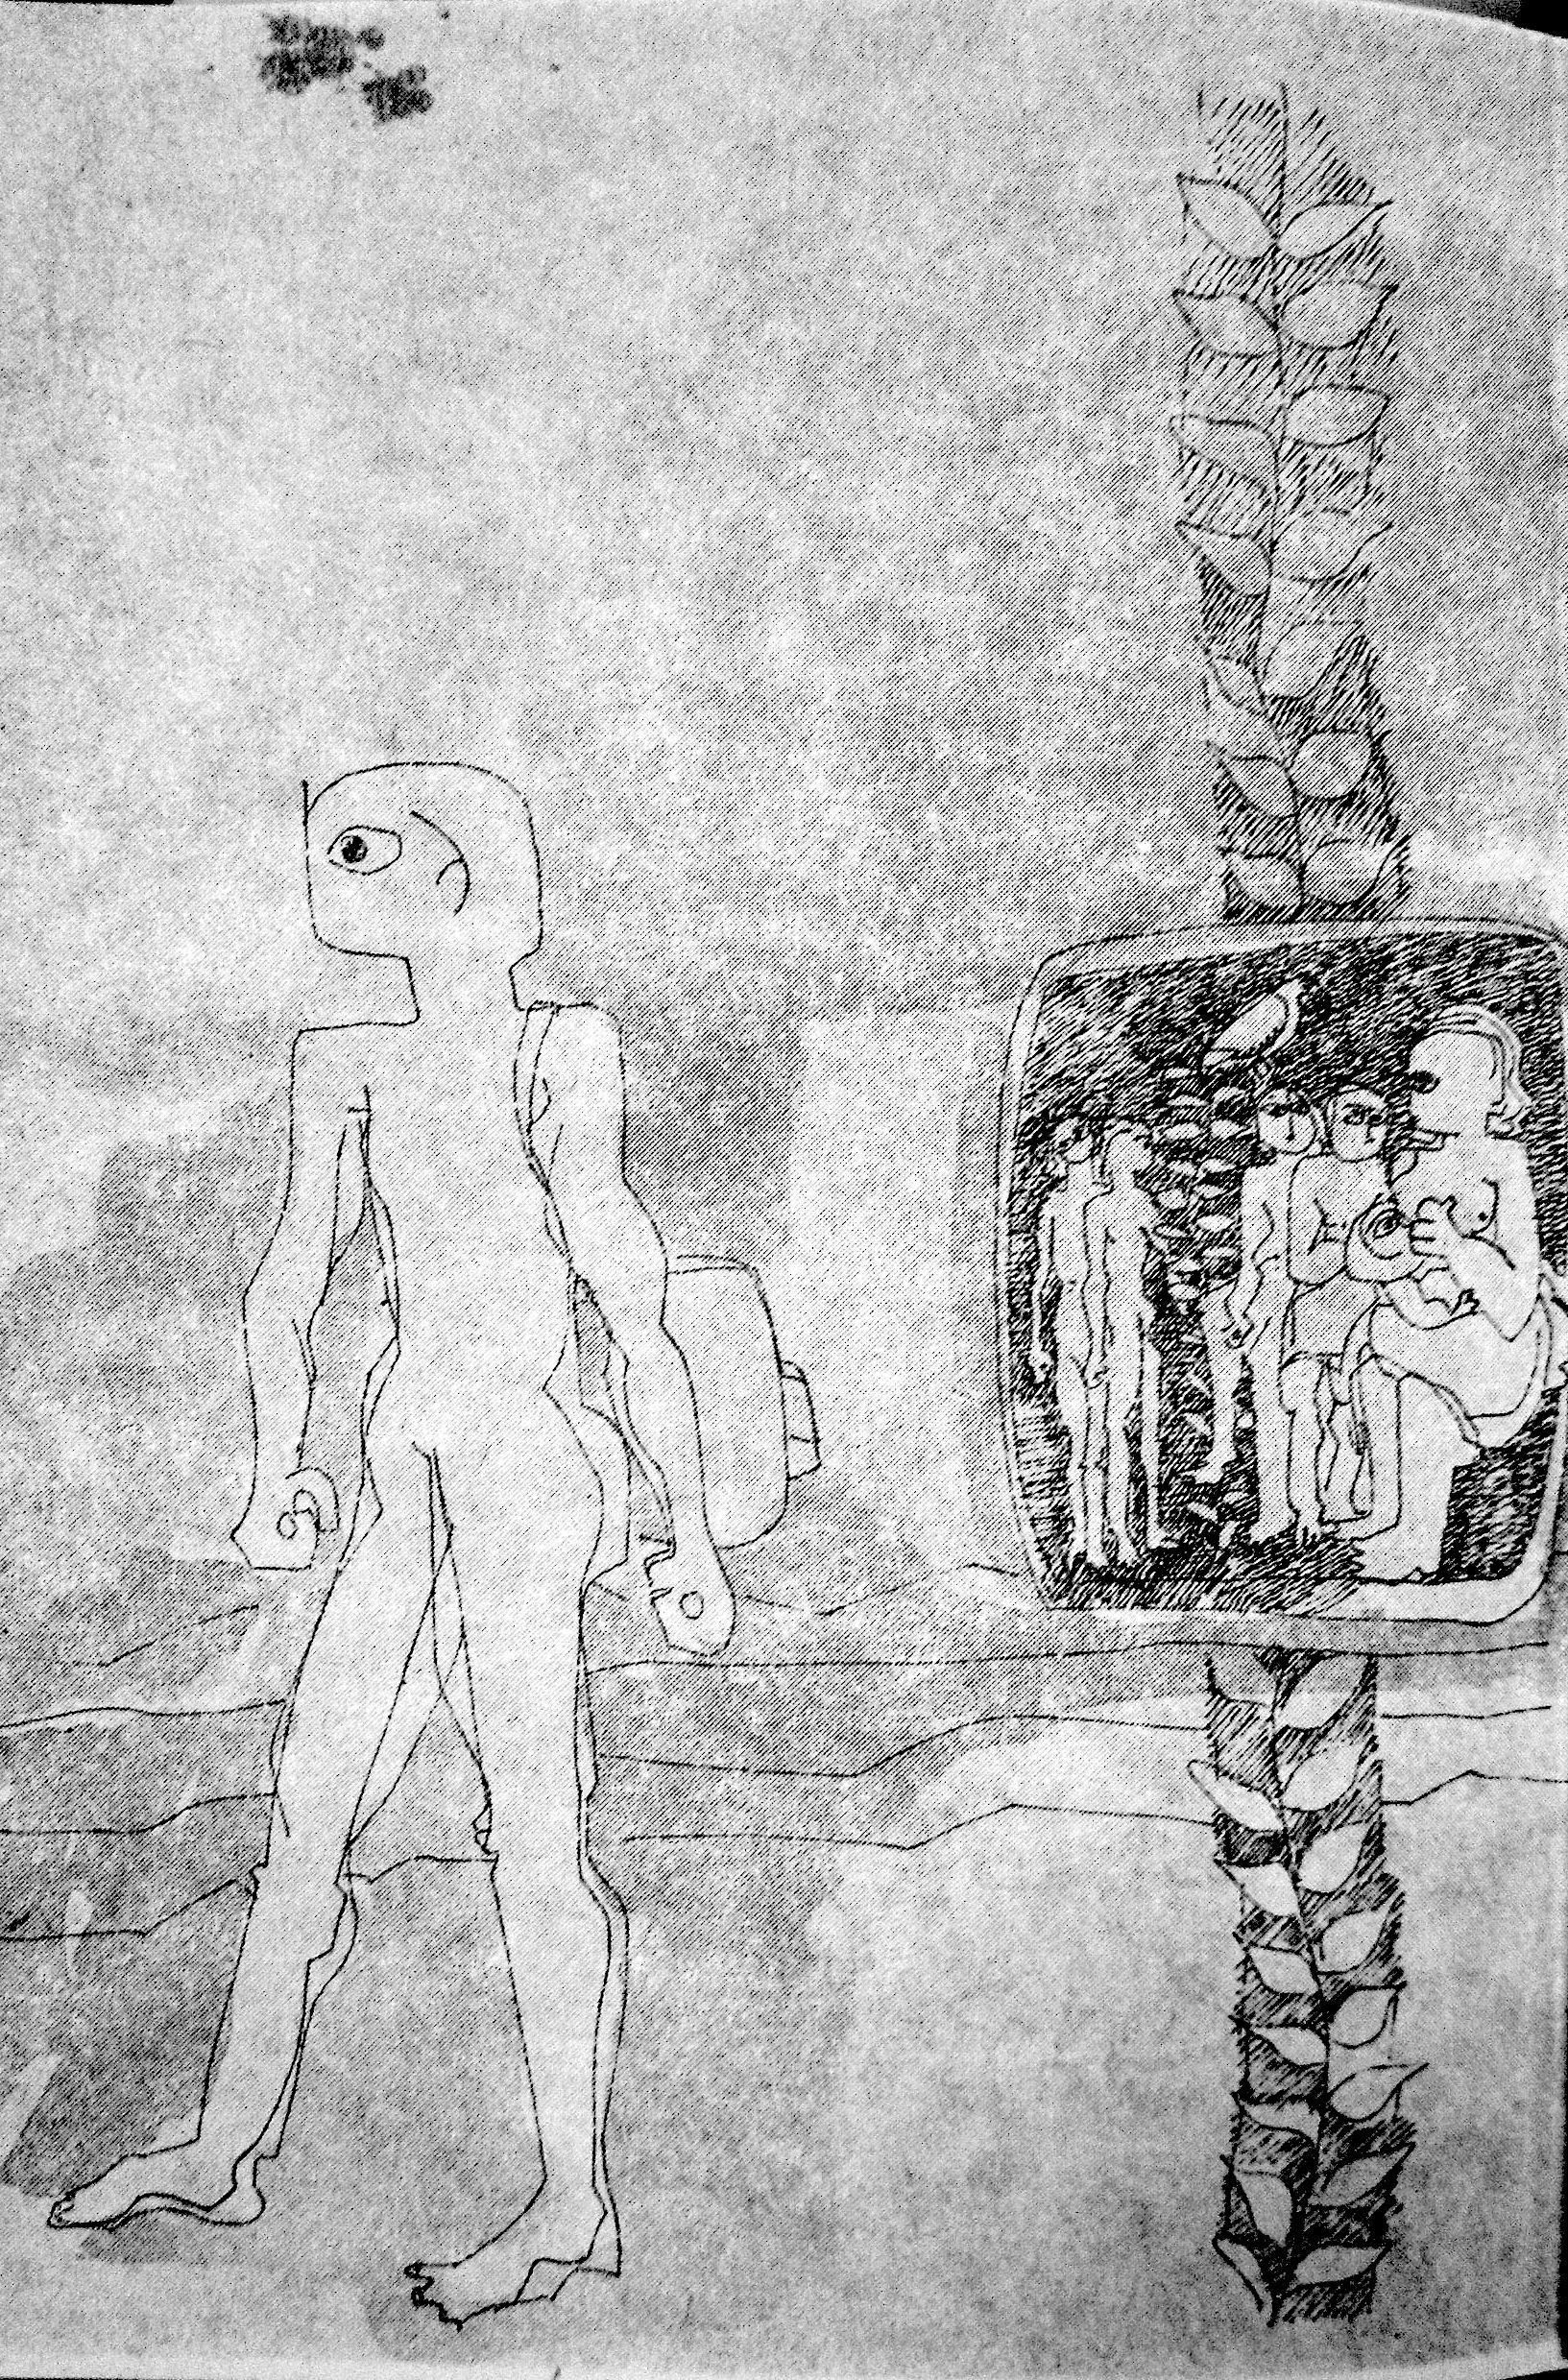 Third in a series by Mona Saudi, in Ghassān Kanafānī's  al-Āthār al-kāmilah , Vol. 1 (Beirut: Dār al-Ṭalīʿah, 1972).